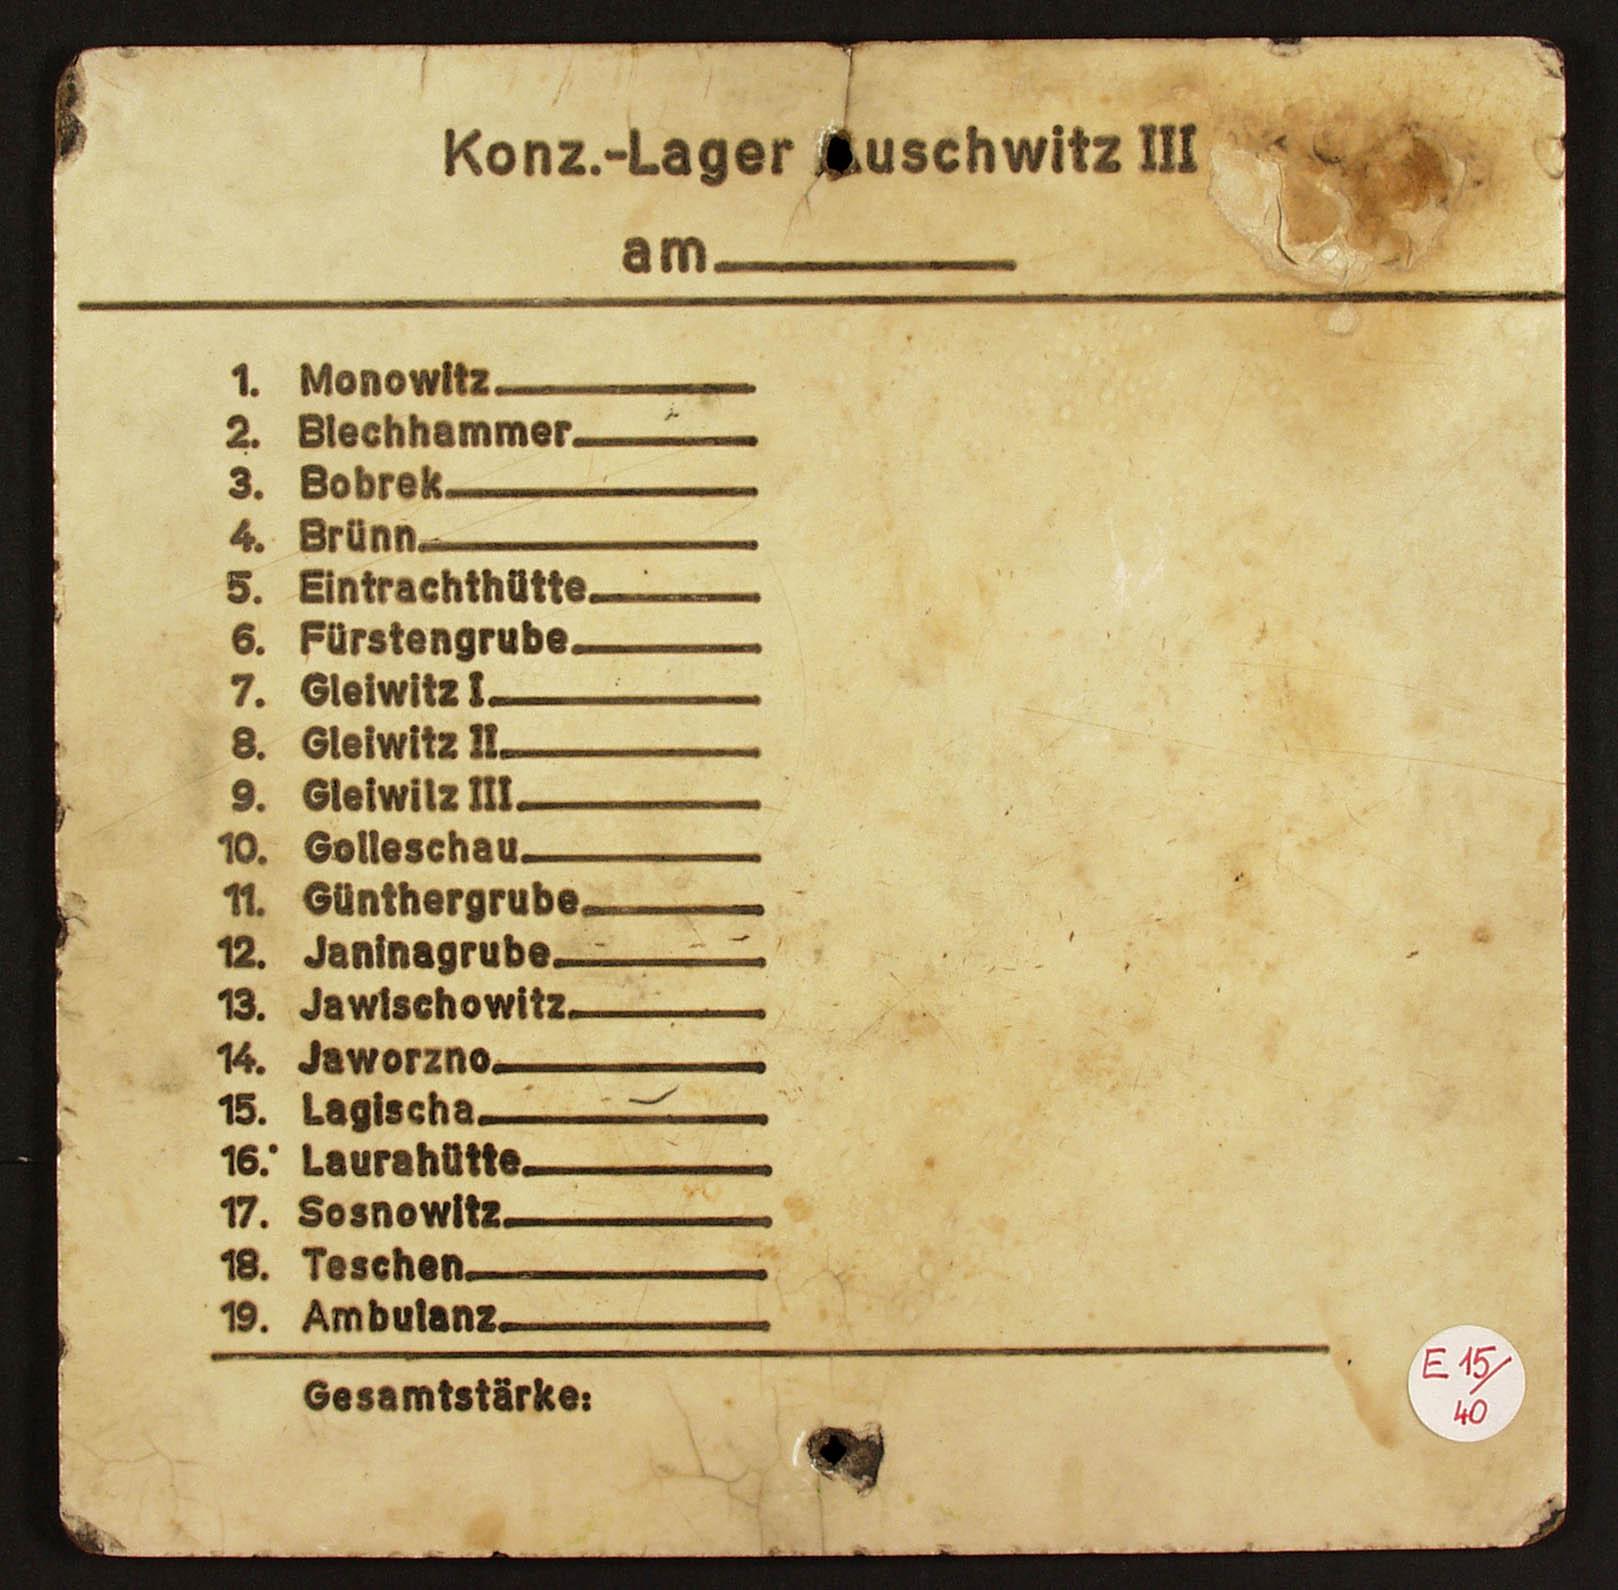 Auschwitz III Monowitz prisoner strength PMO II 4 266